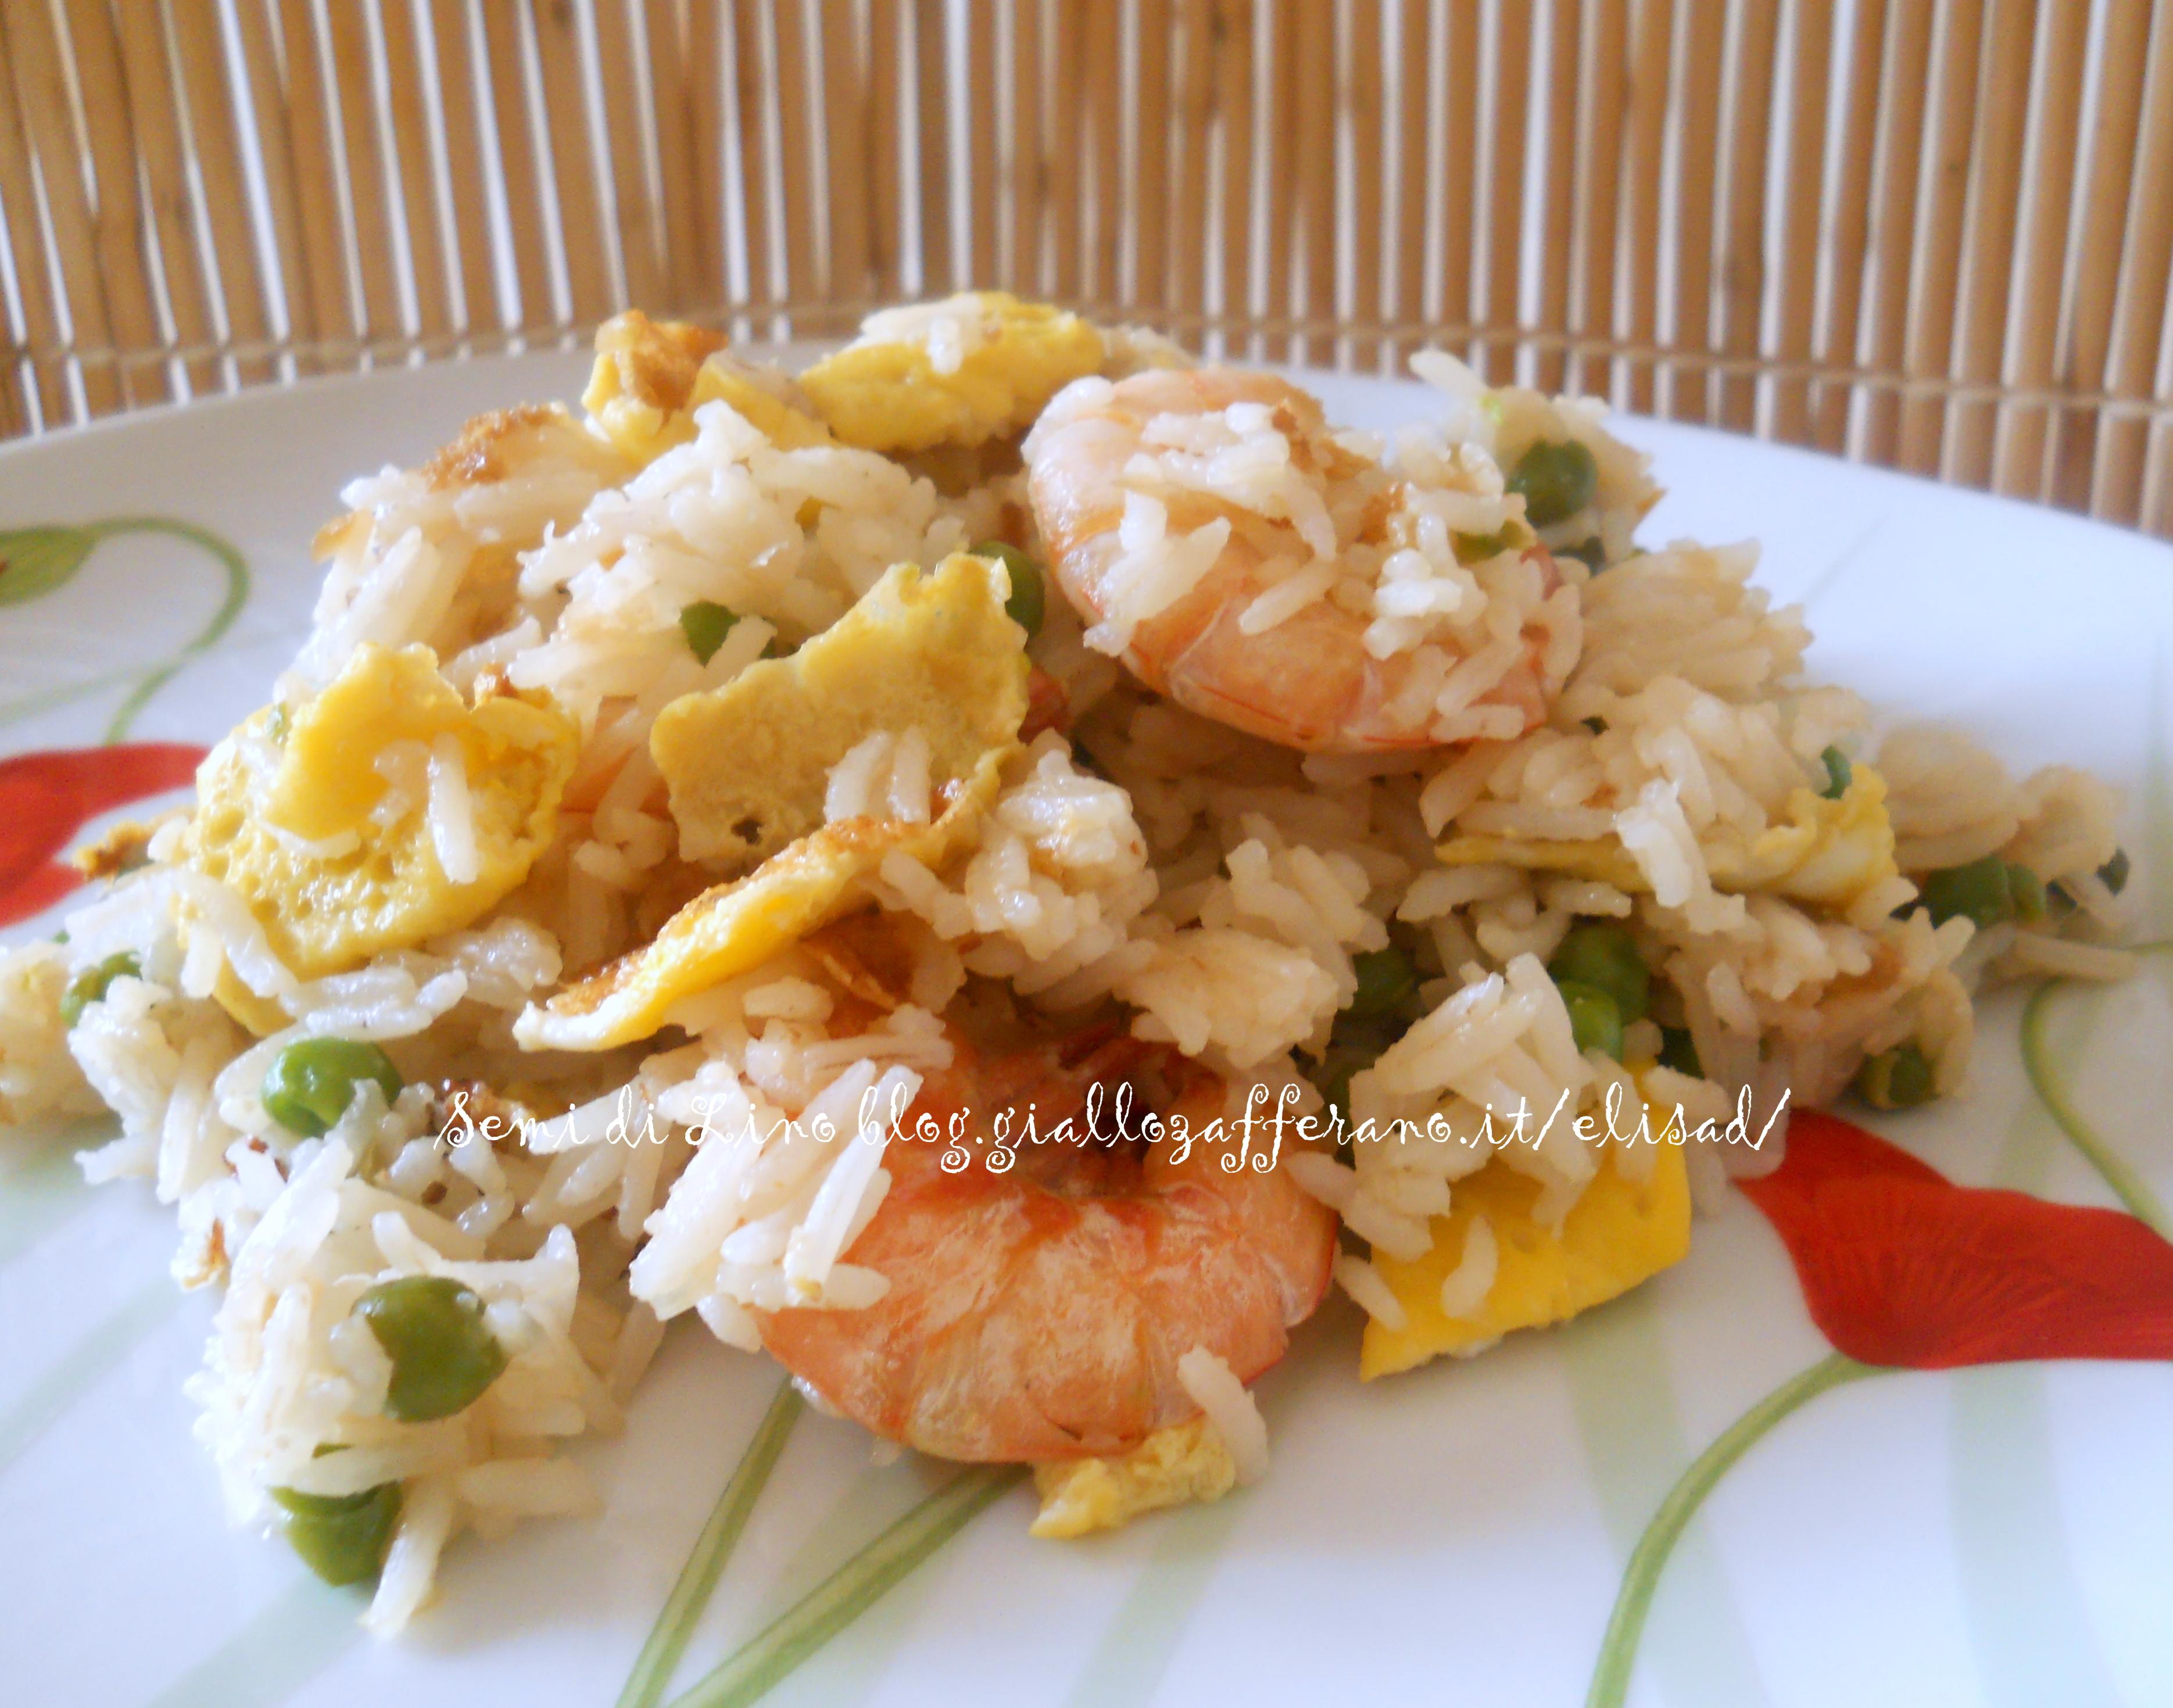 Riso cinese ai gamberi ricetta orientale semi di lino for Menu cinese ricette